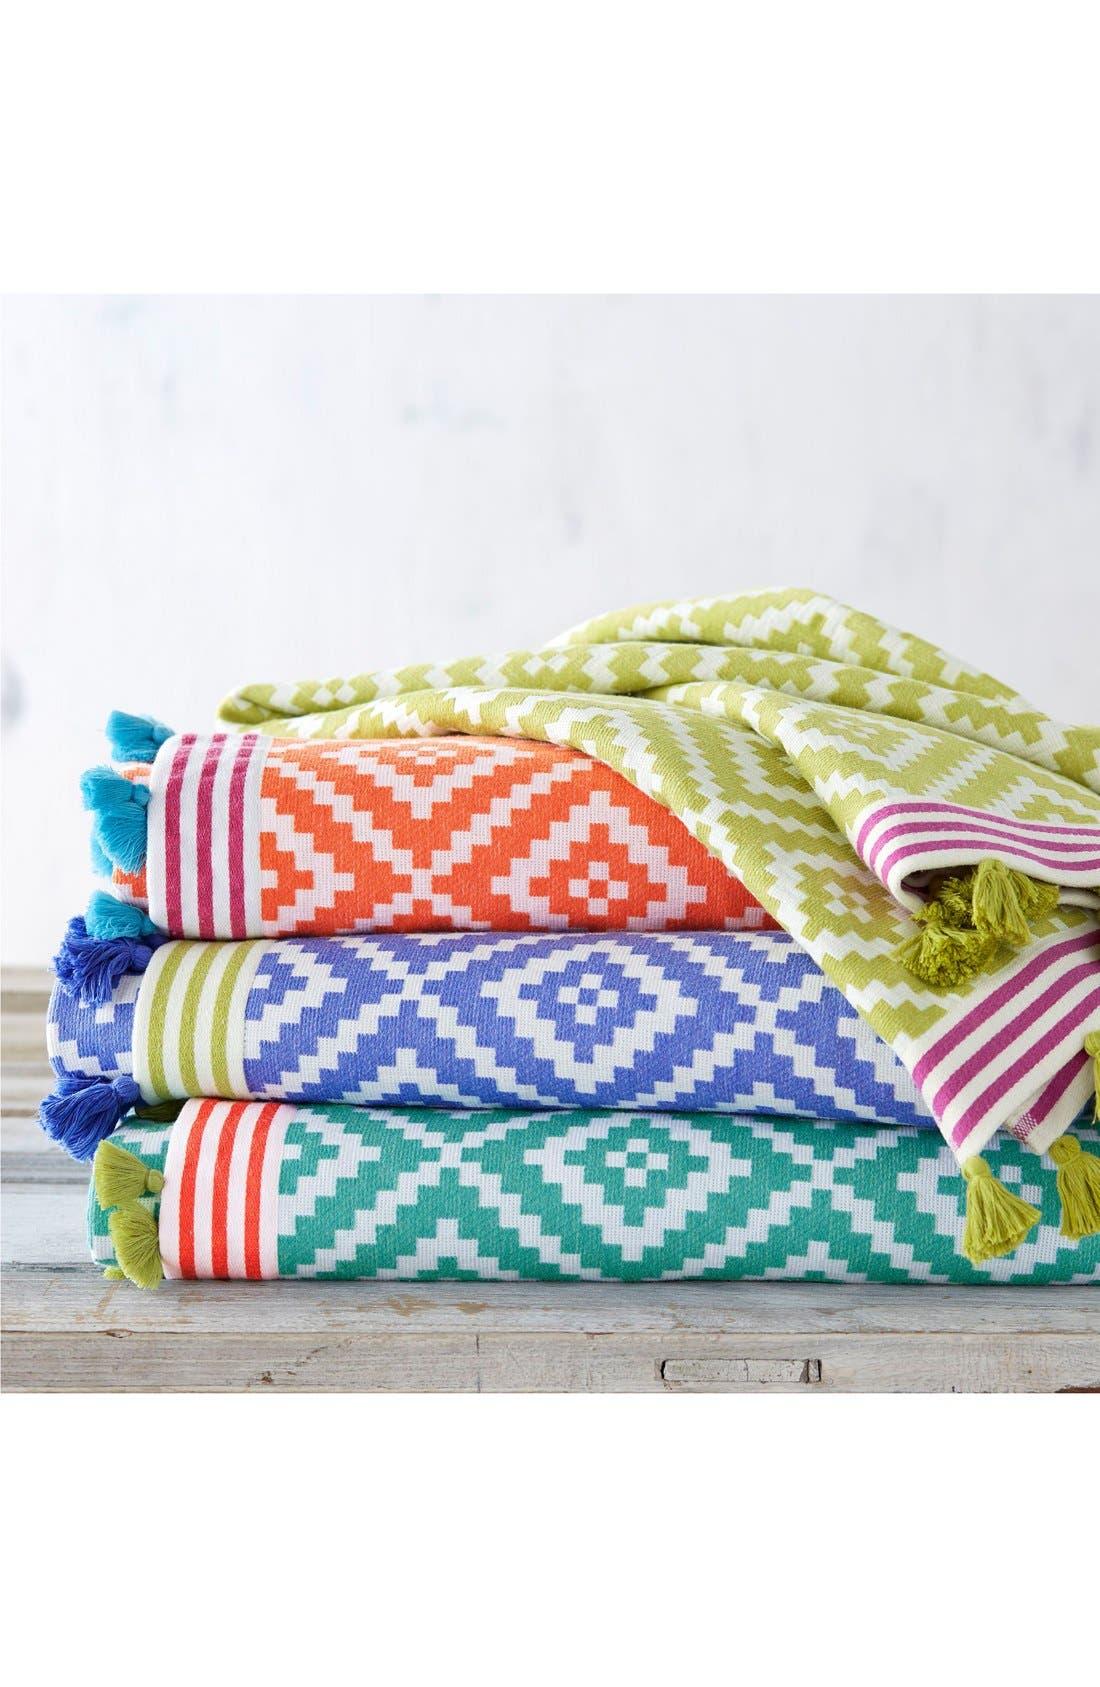 'Alabat' Beach Towel,                             Alternate thumbnail 3, color,                             950